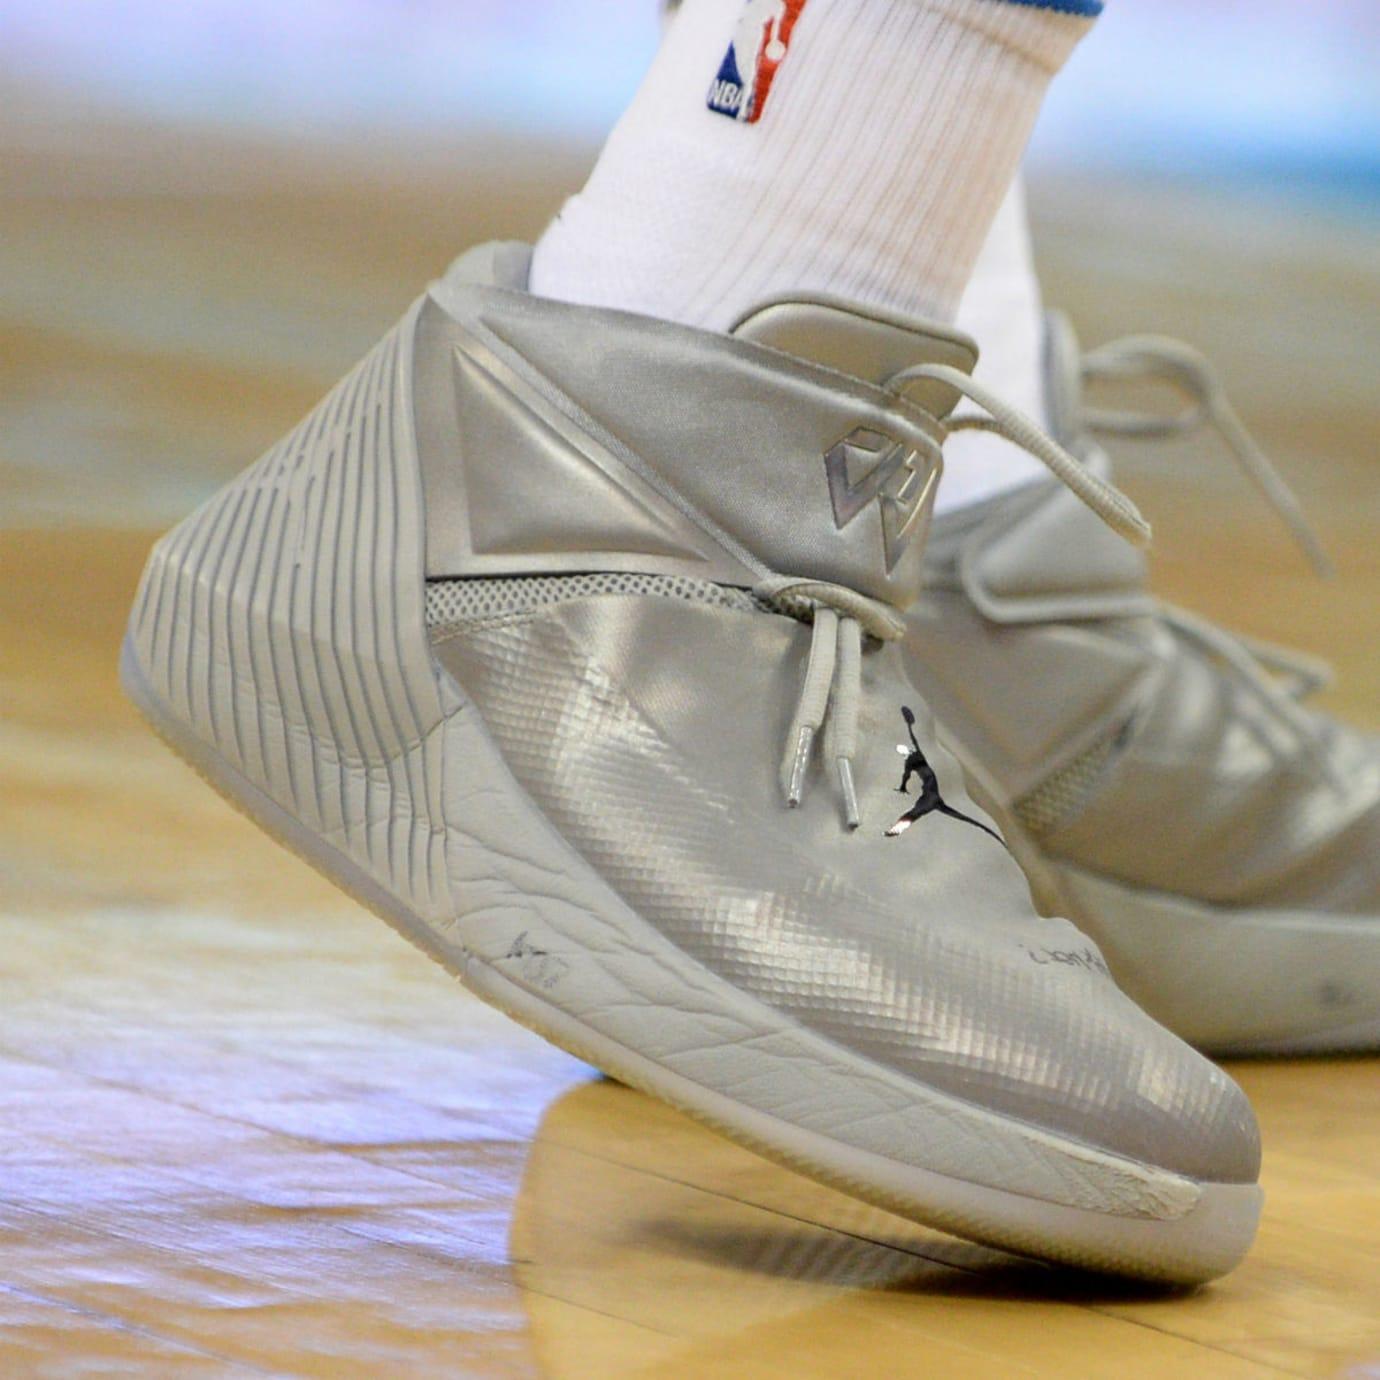 Russell Westbrook Triple-Double Average Jordan Why Not Zer0.1 Silver On-Foot